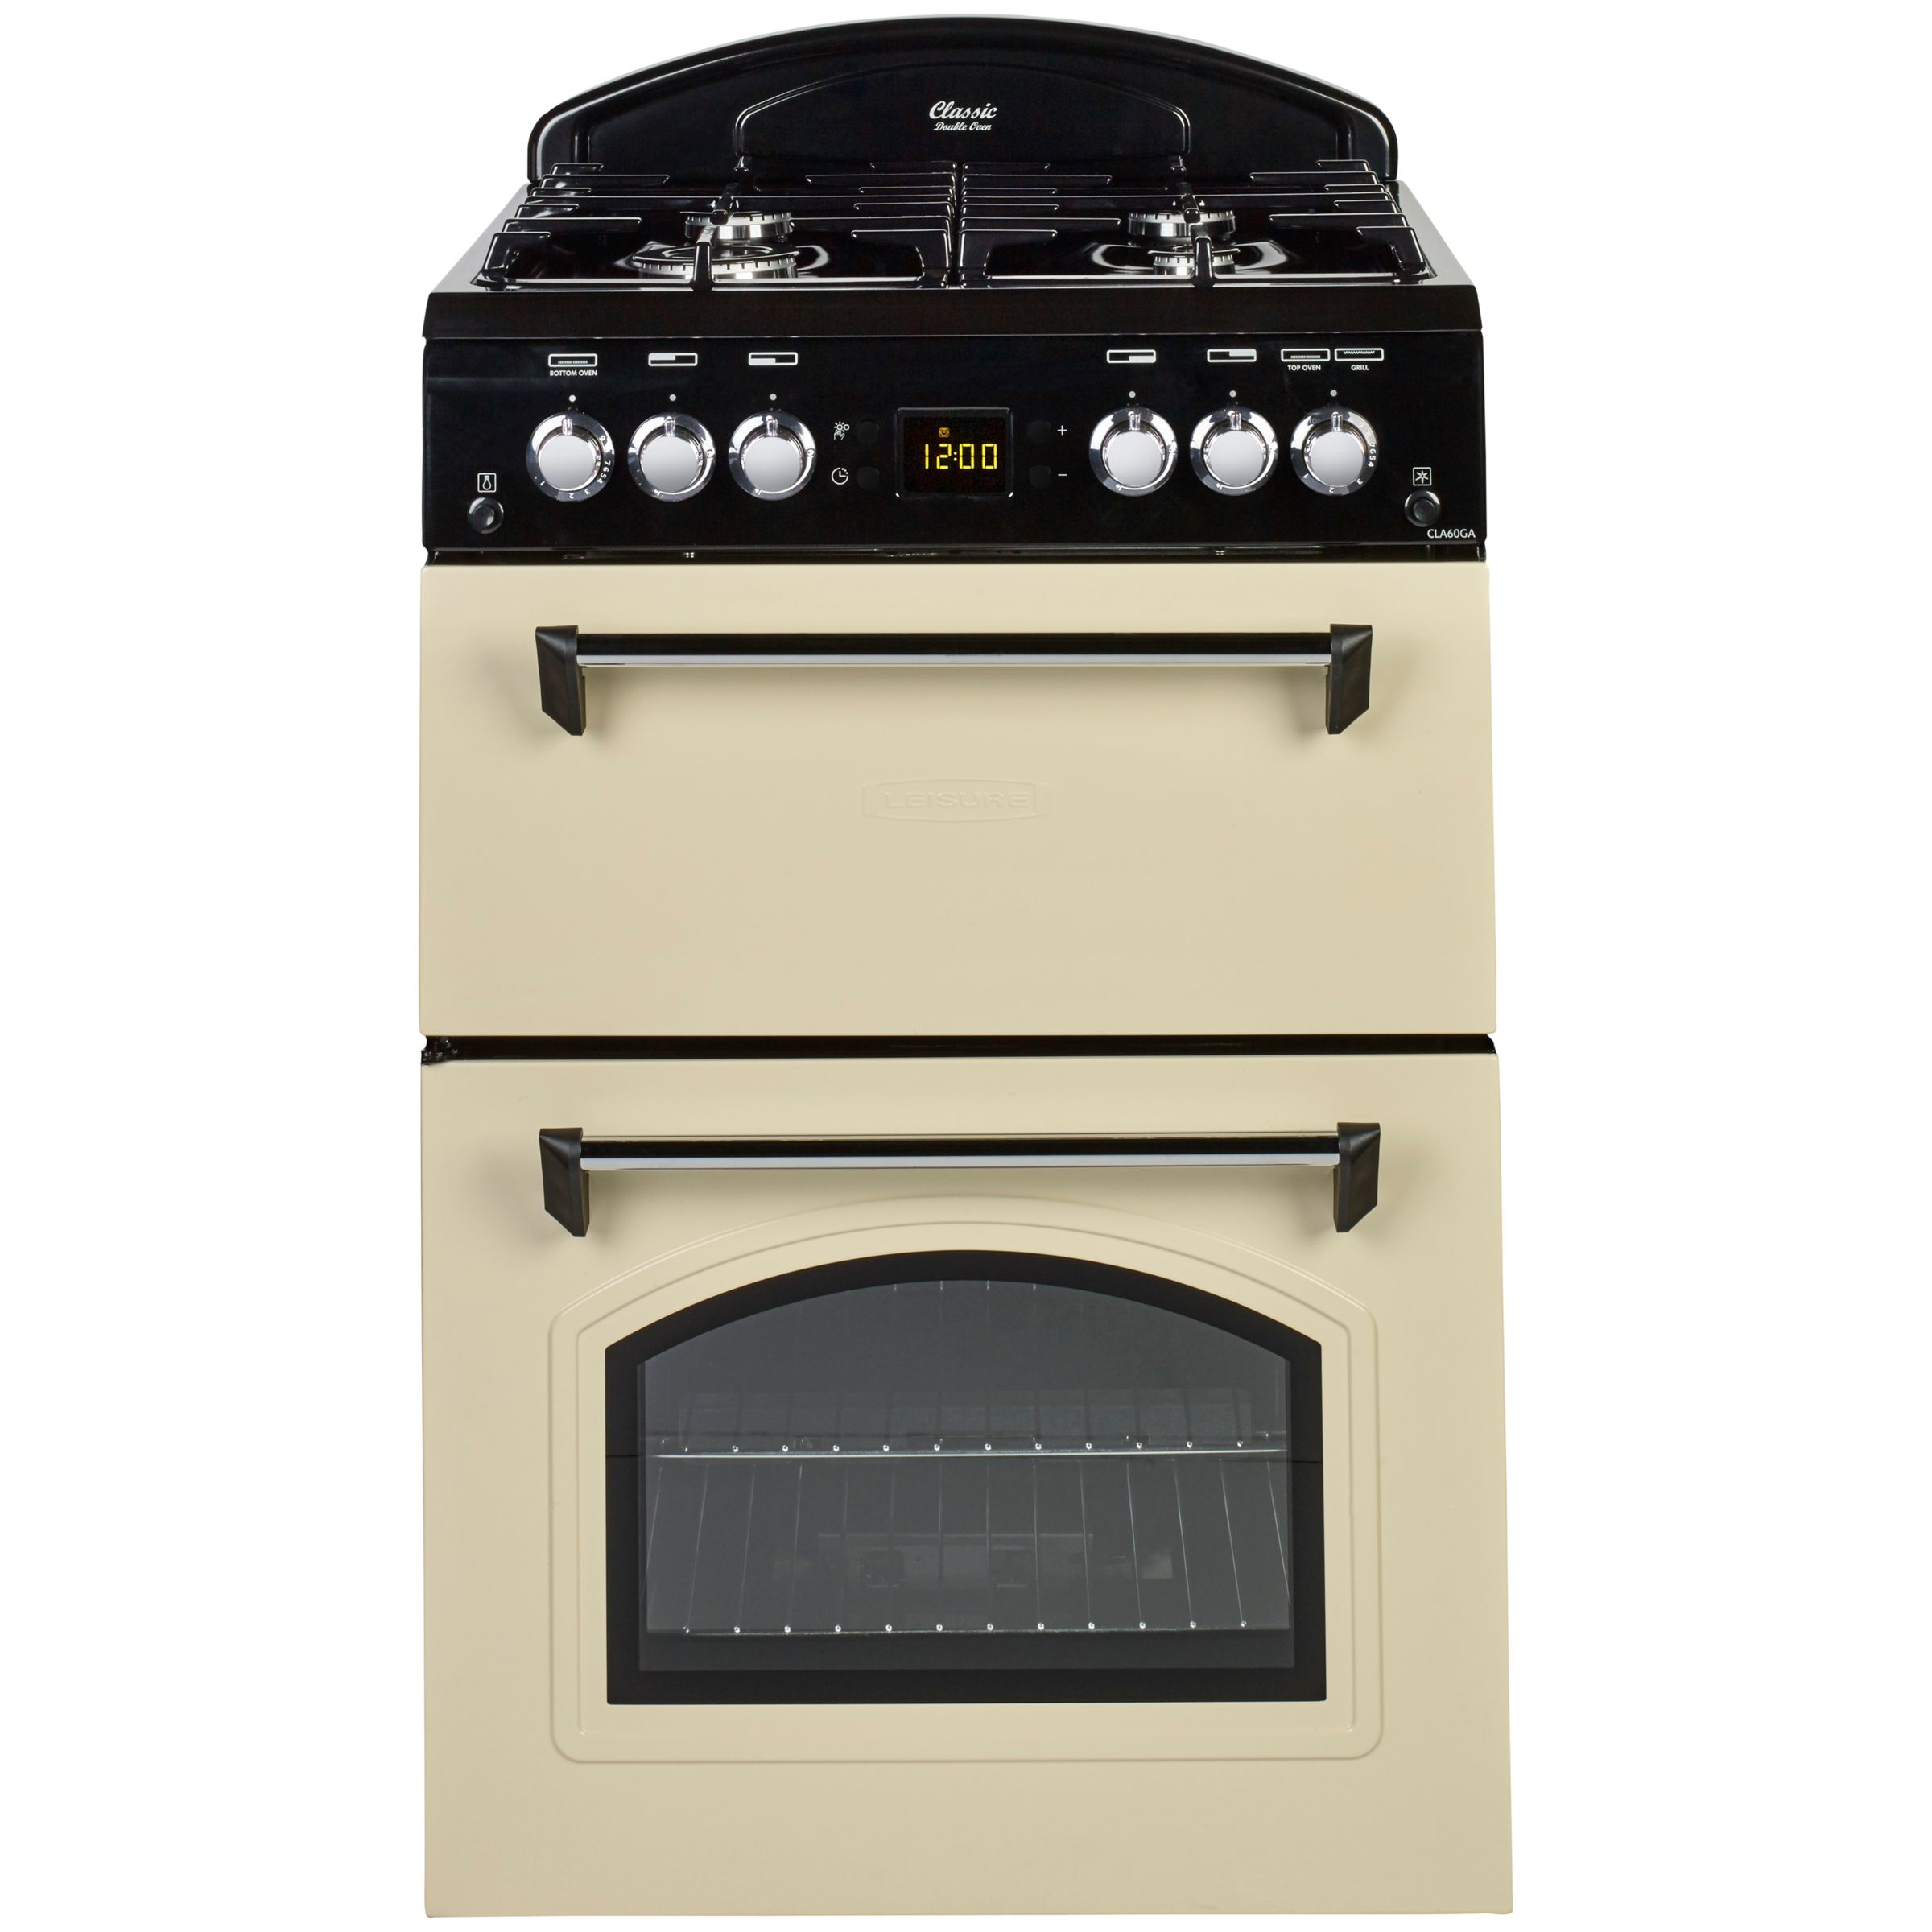 Leisure Leisure CLA60GA Classic Gas Cooker